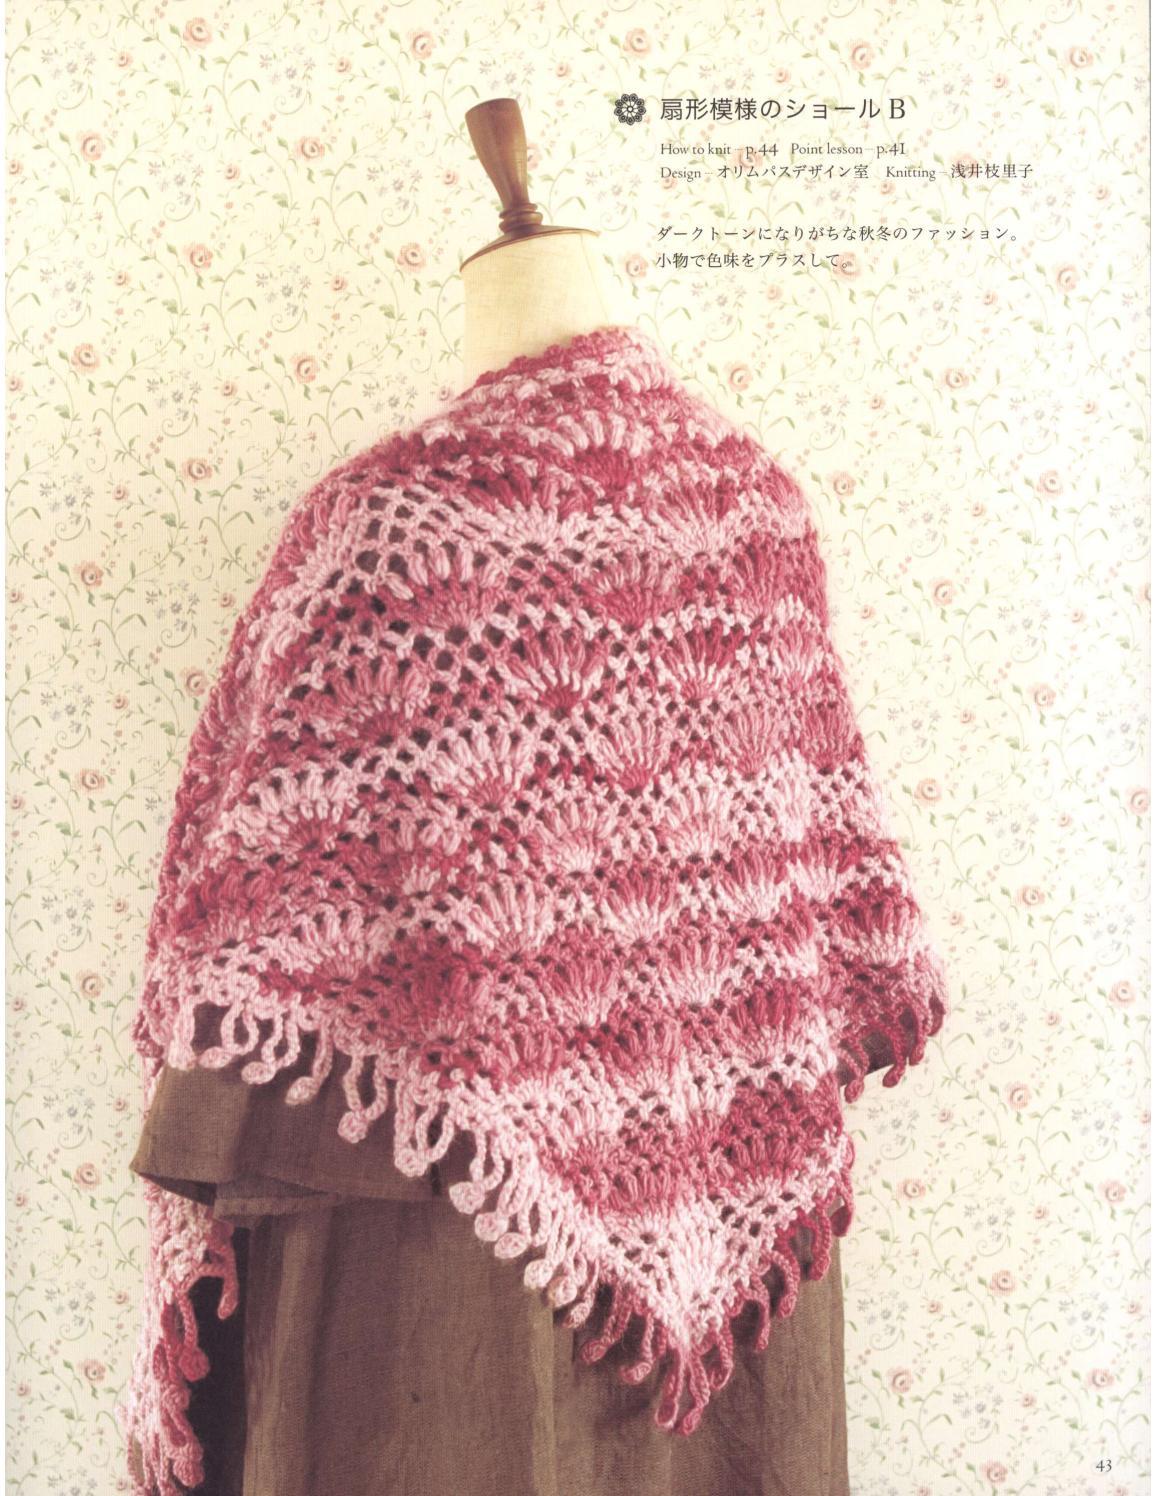 Asahi original crochet best selection 2012 page 43